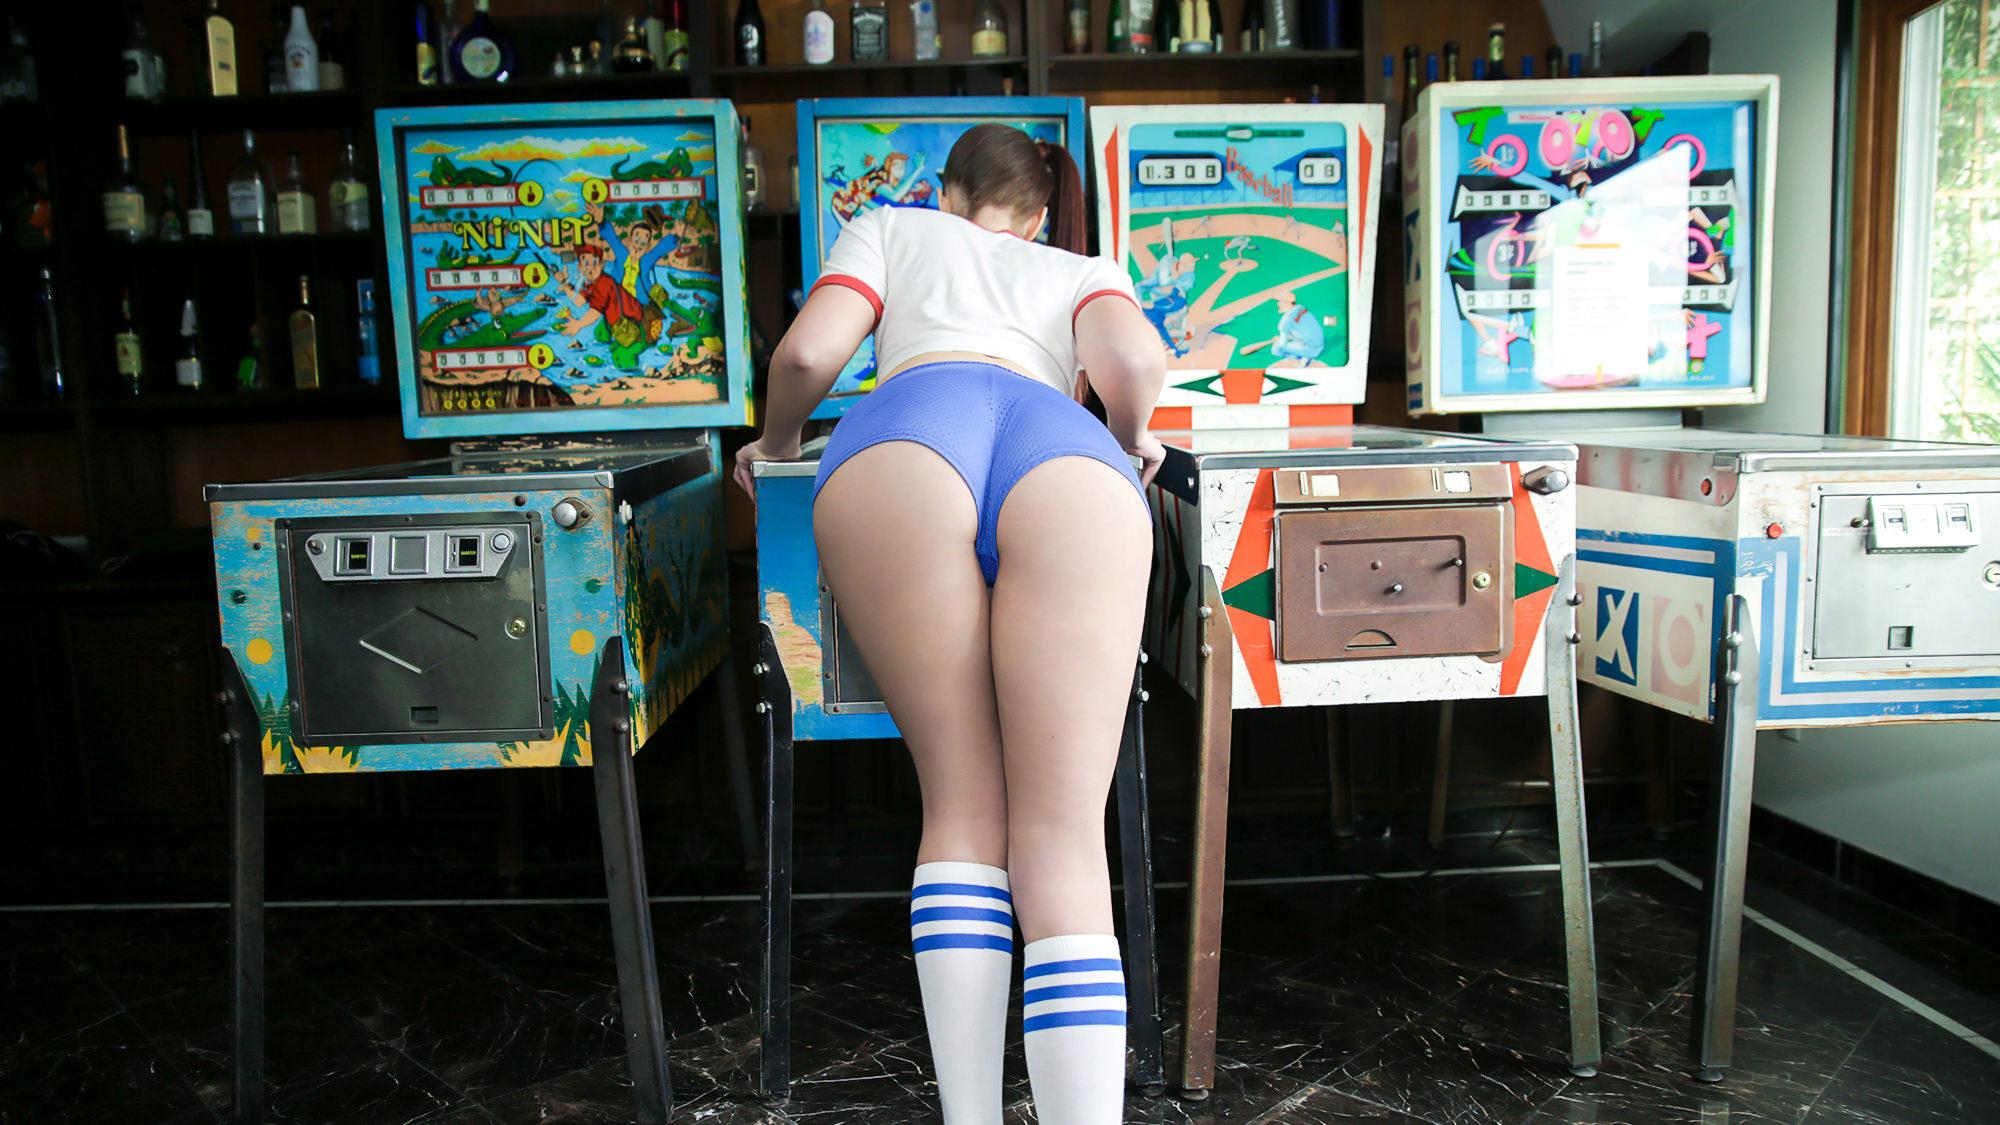 Teen Pinball Wizard Hits The Creampie Jackpot - Teen Pies